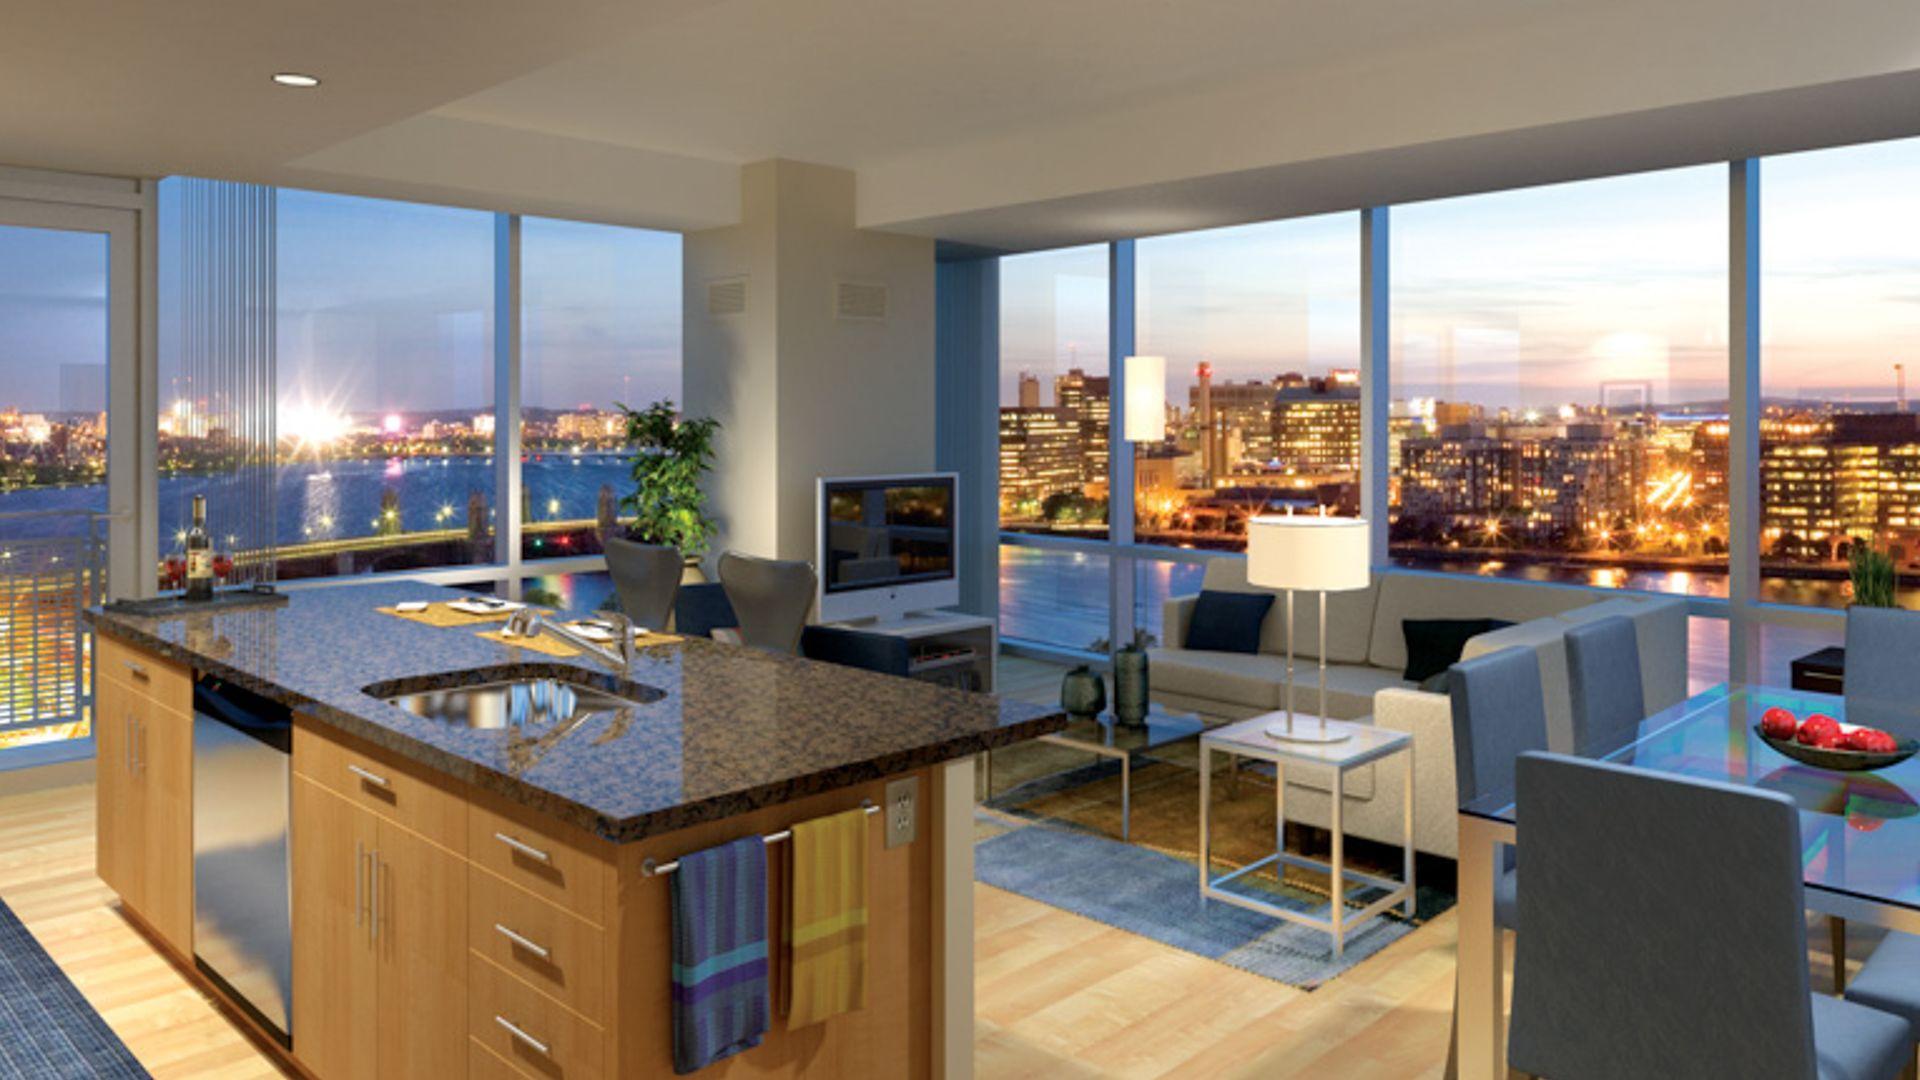 Boston Apartments For Rent Boston Apartment Luxury Bedroom Furniture Coffee Shop Interior Design